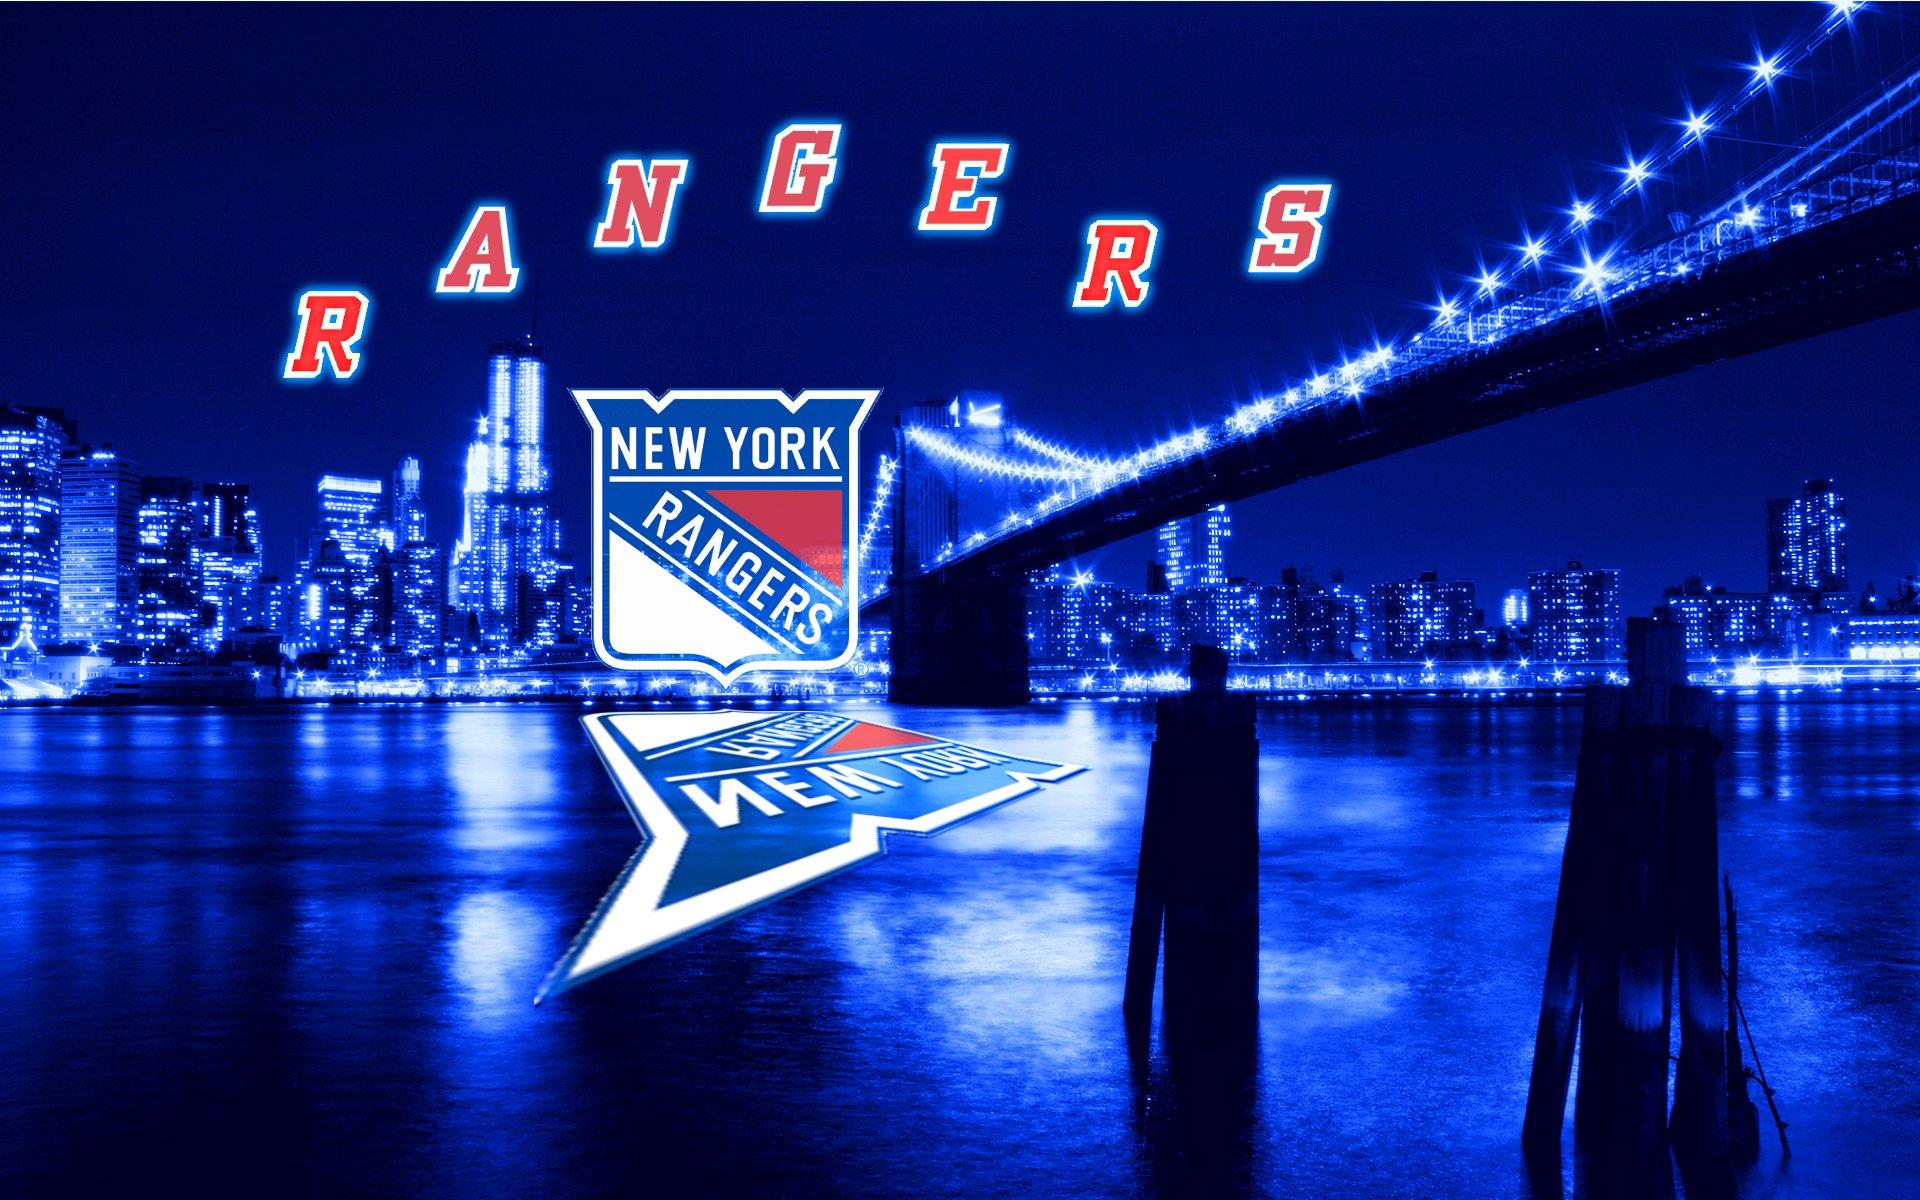 NHL New York Rangers Blue City Wallpaper by Realyze on 1920x1200